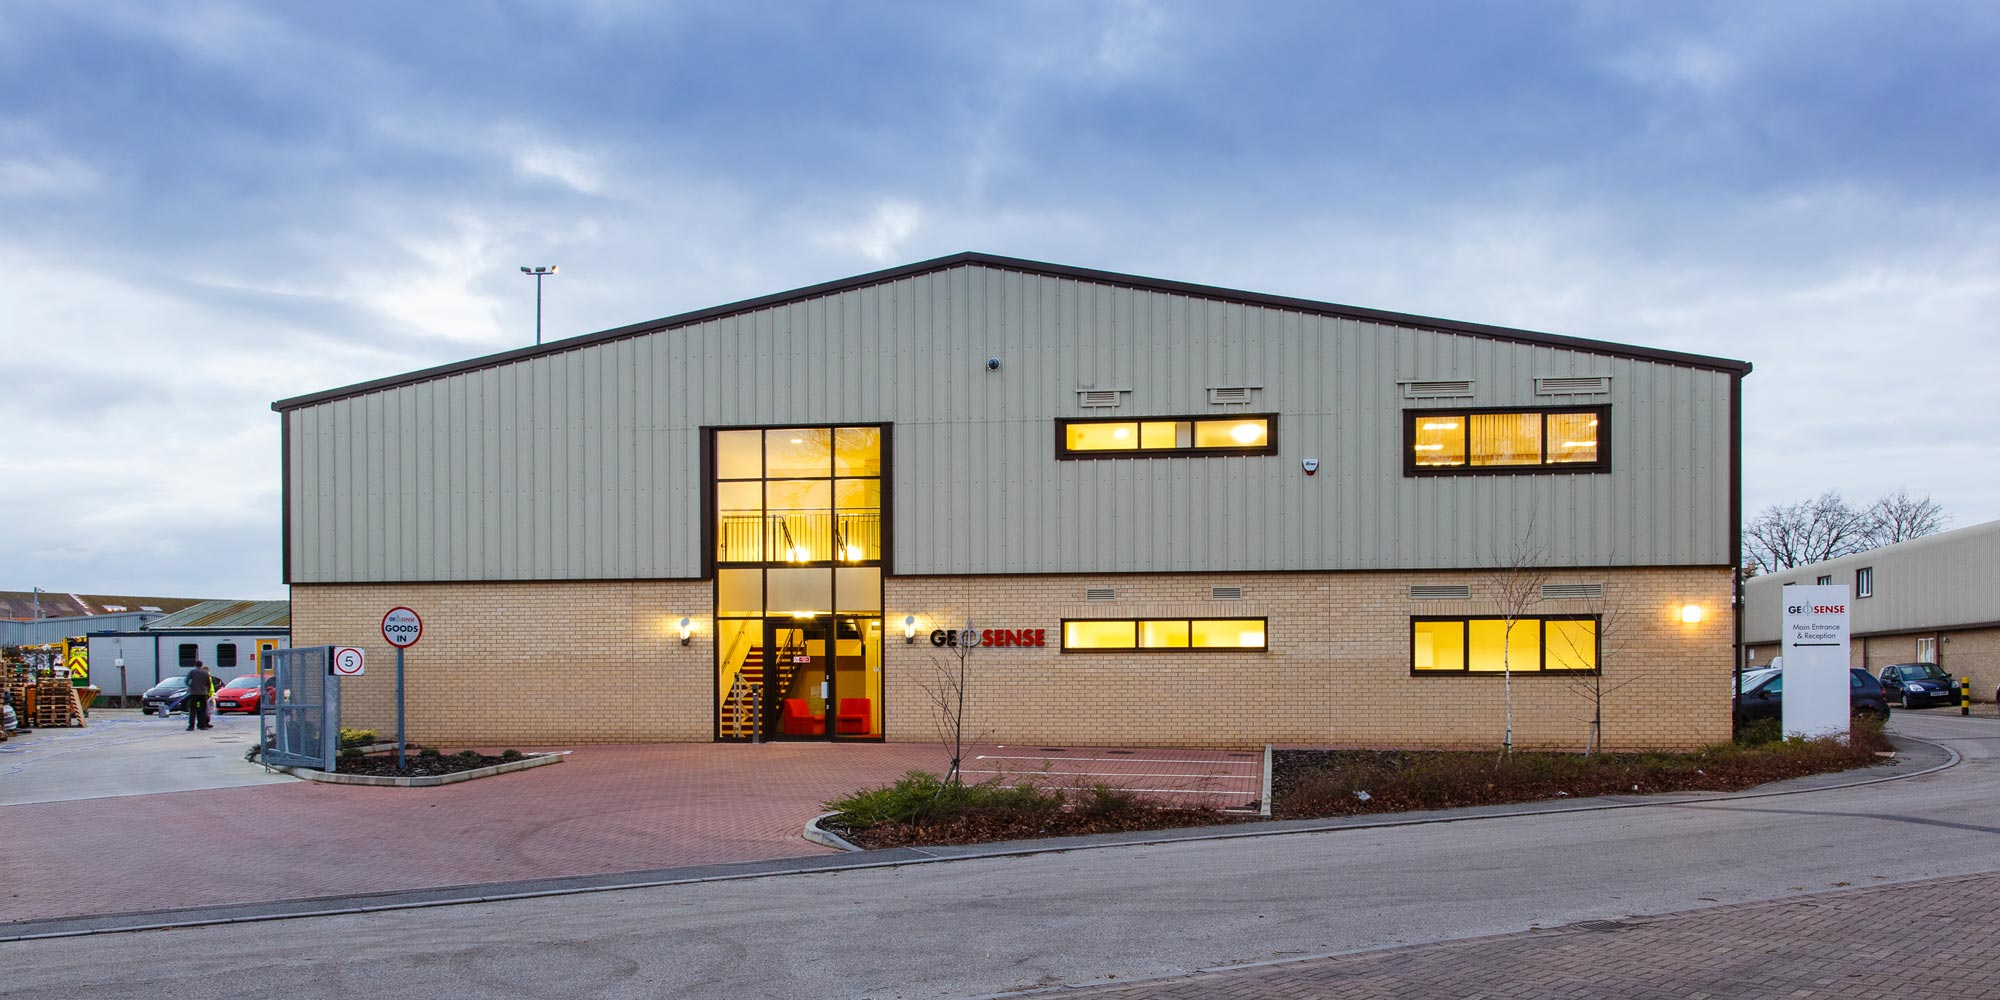 Geosense headquarters & manufacturing base in Bury St Edmunds, England